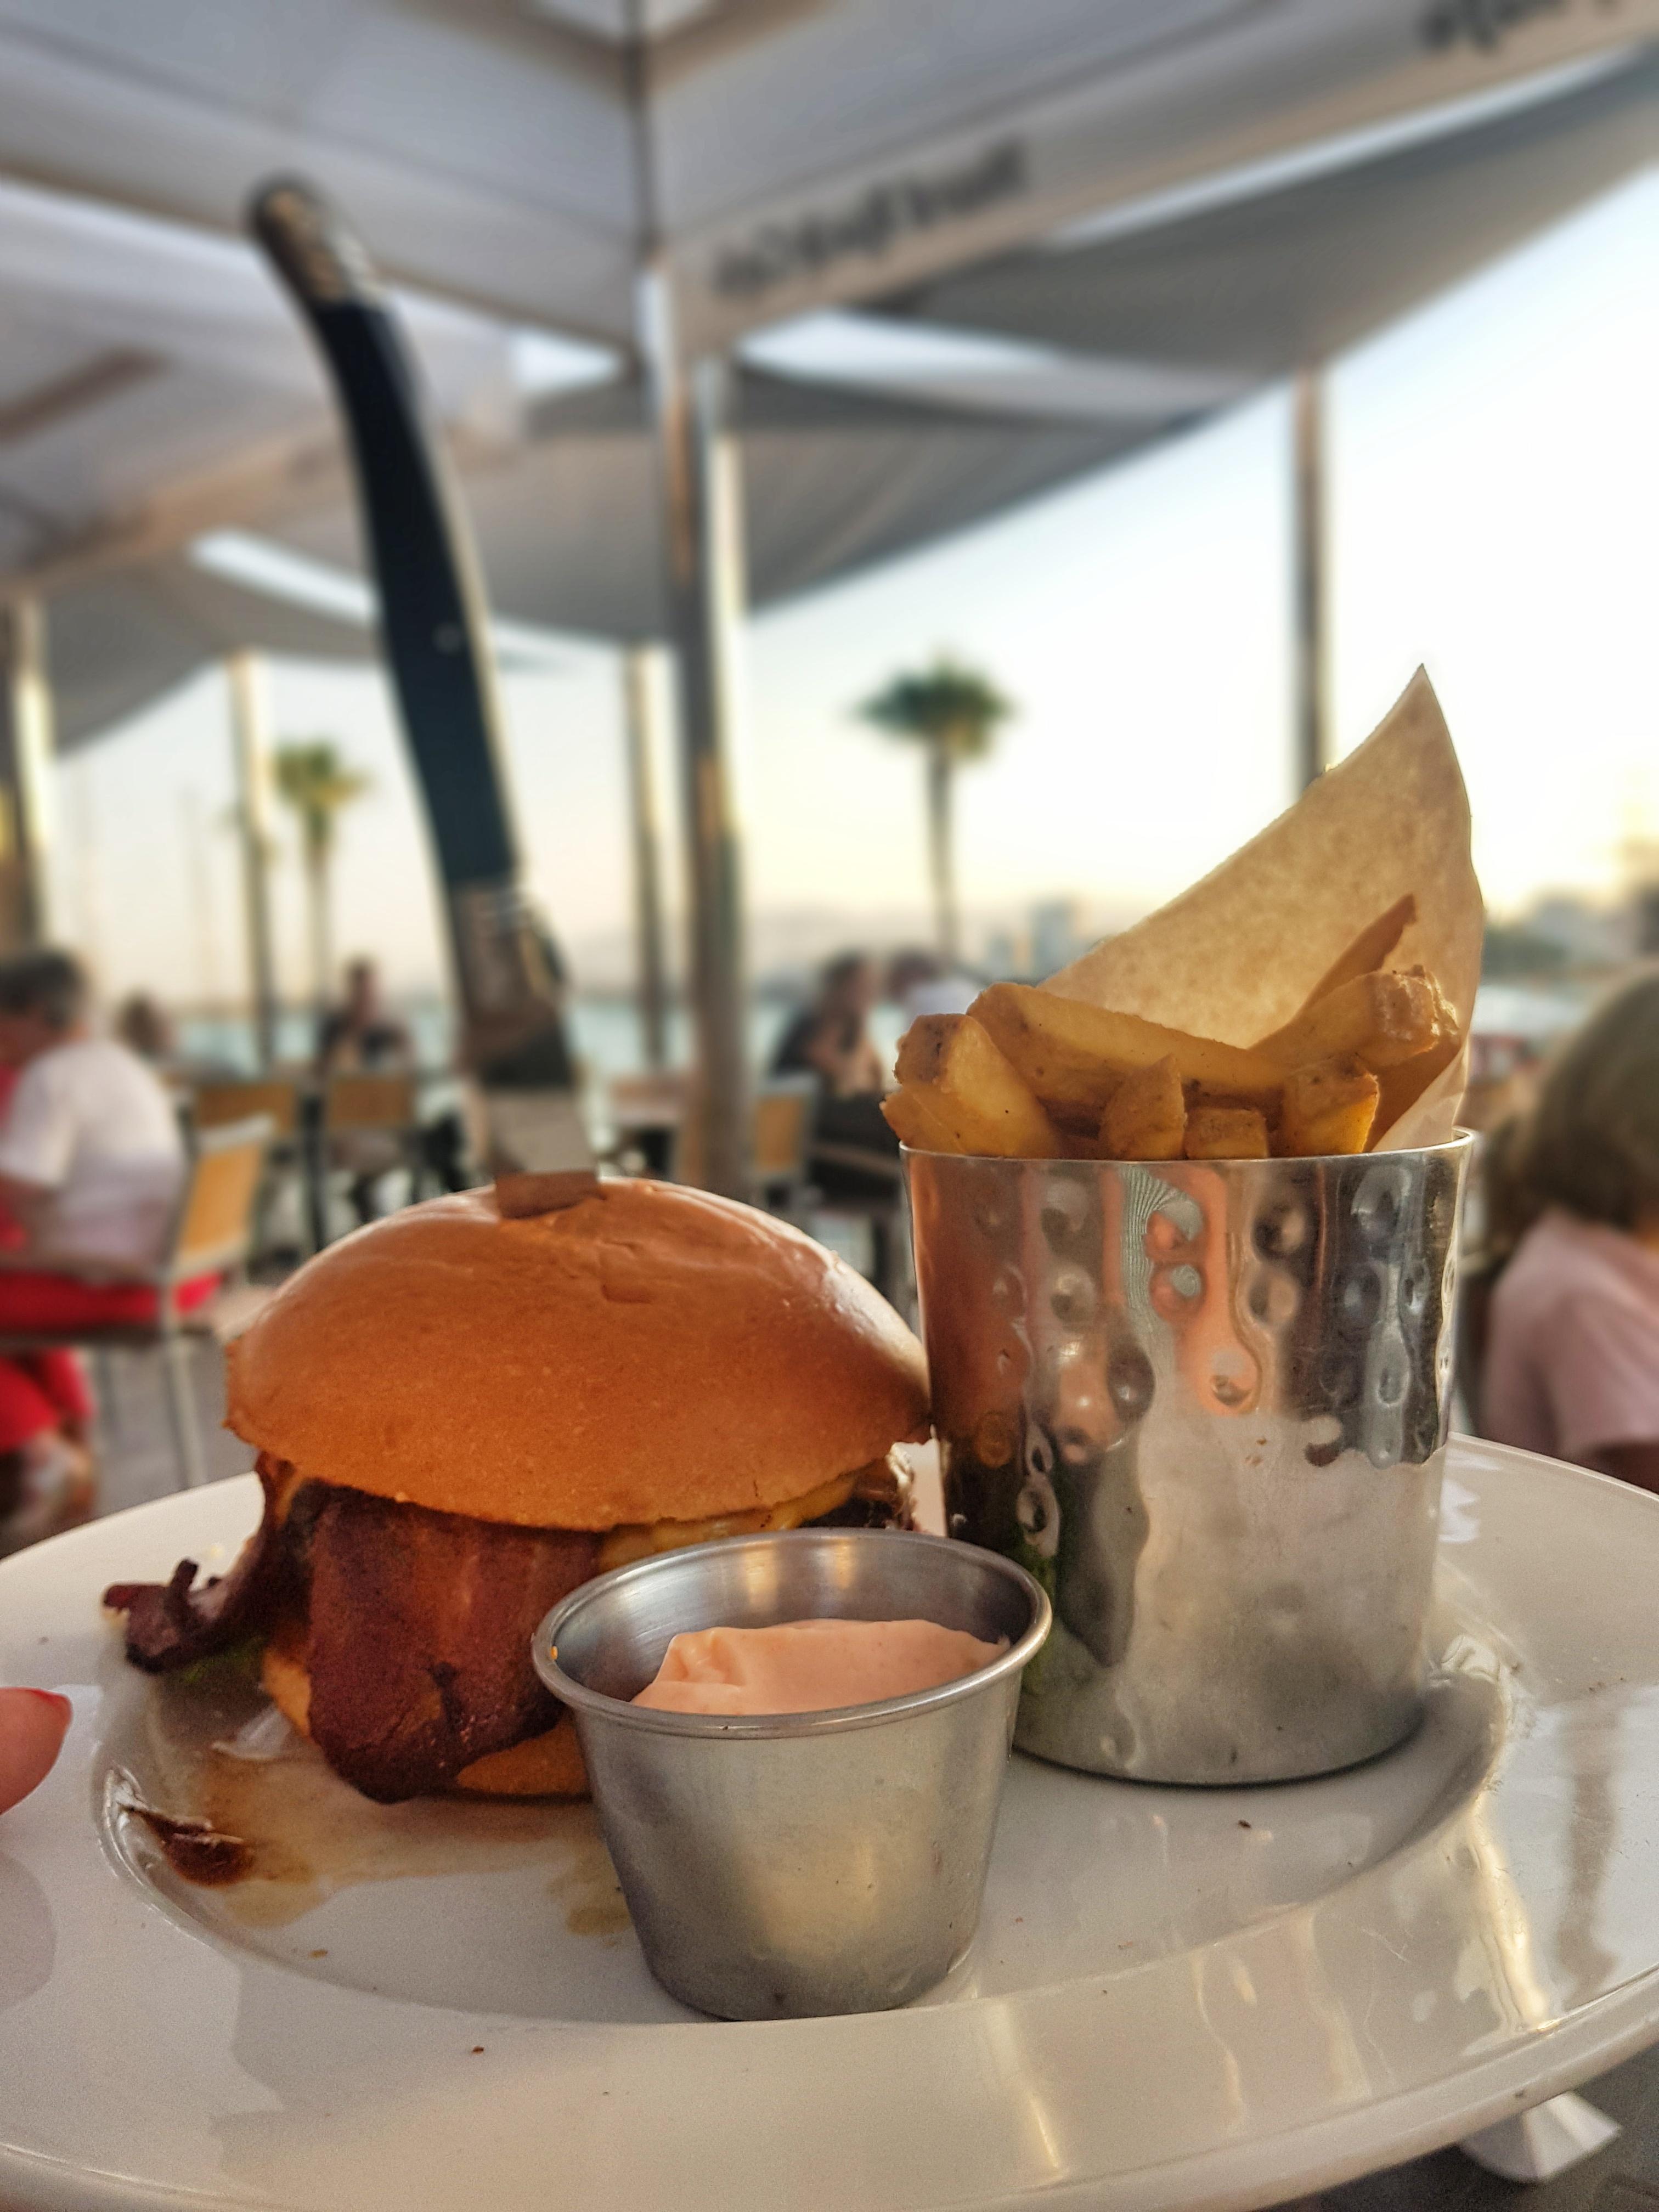 hardrockcafe_malaga_tooftoprestaurant_hardrockburger